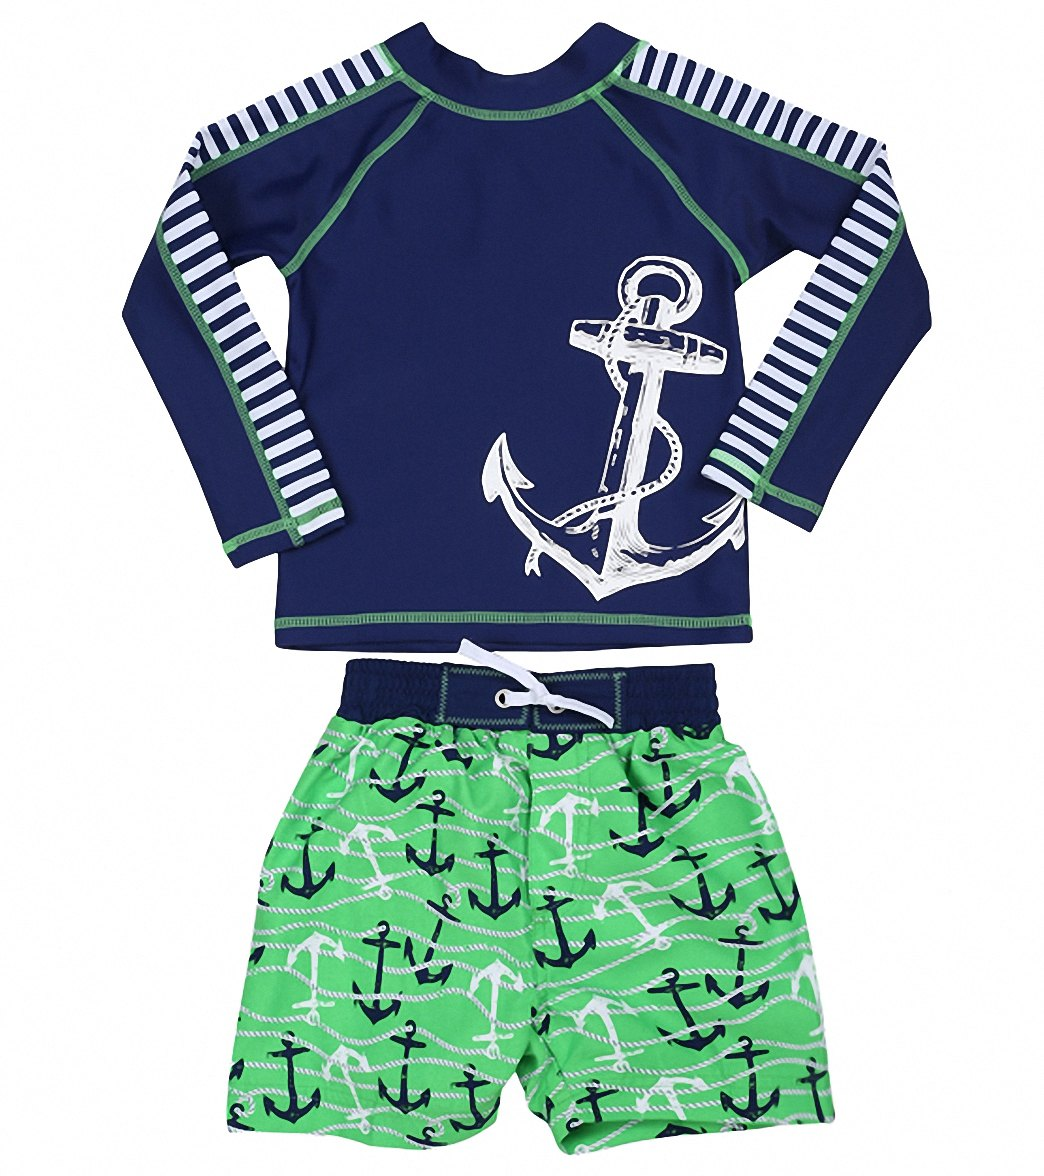 cf0ab47a36 Cabana Life Boys' Anchors Swim Short & L/S Rashguard Set (2T-4T) at ...